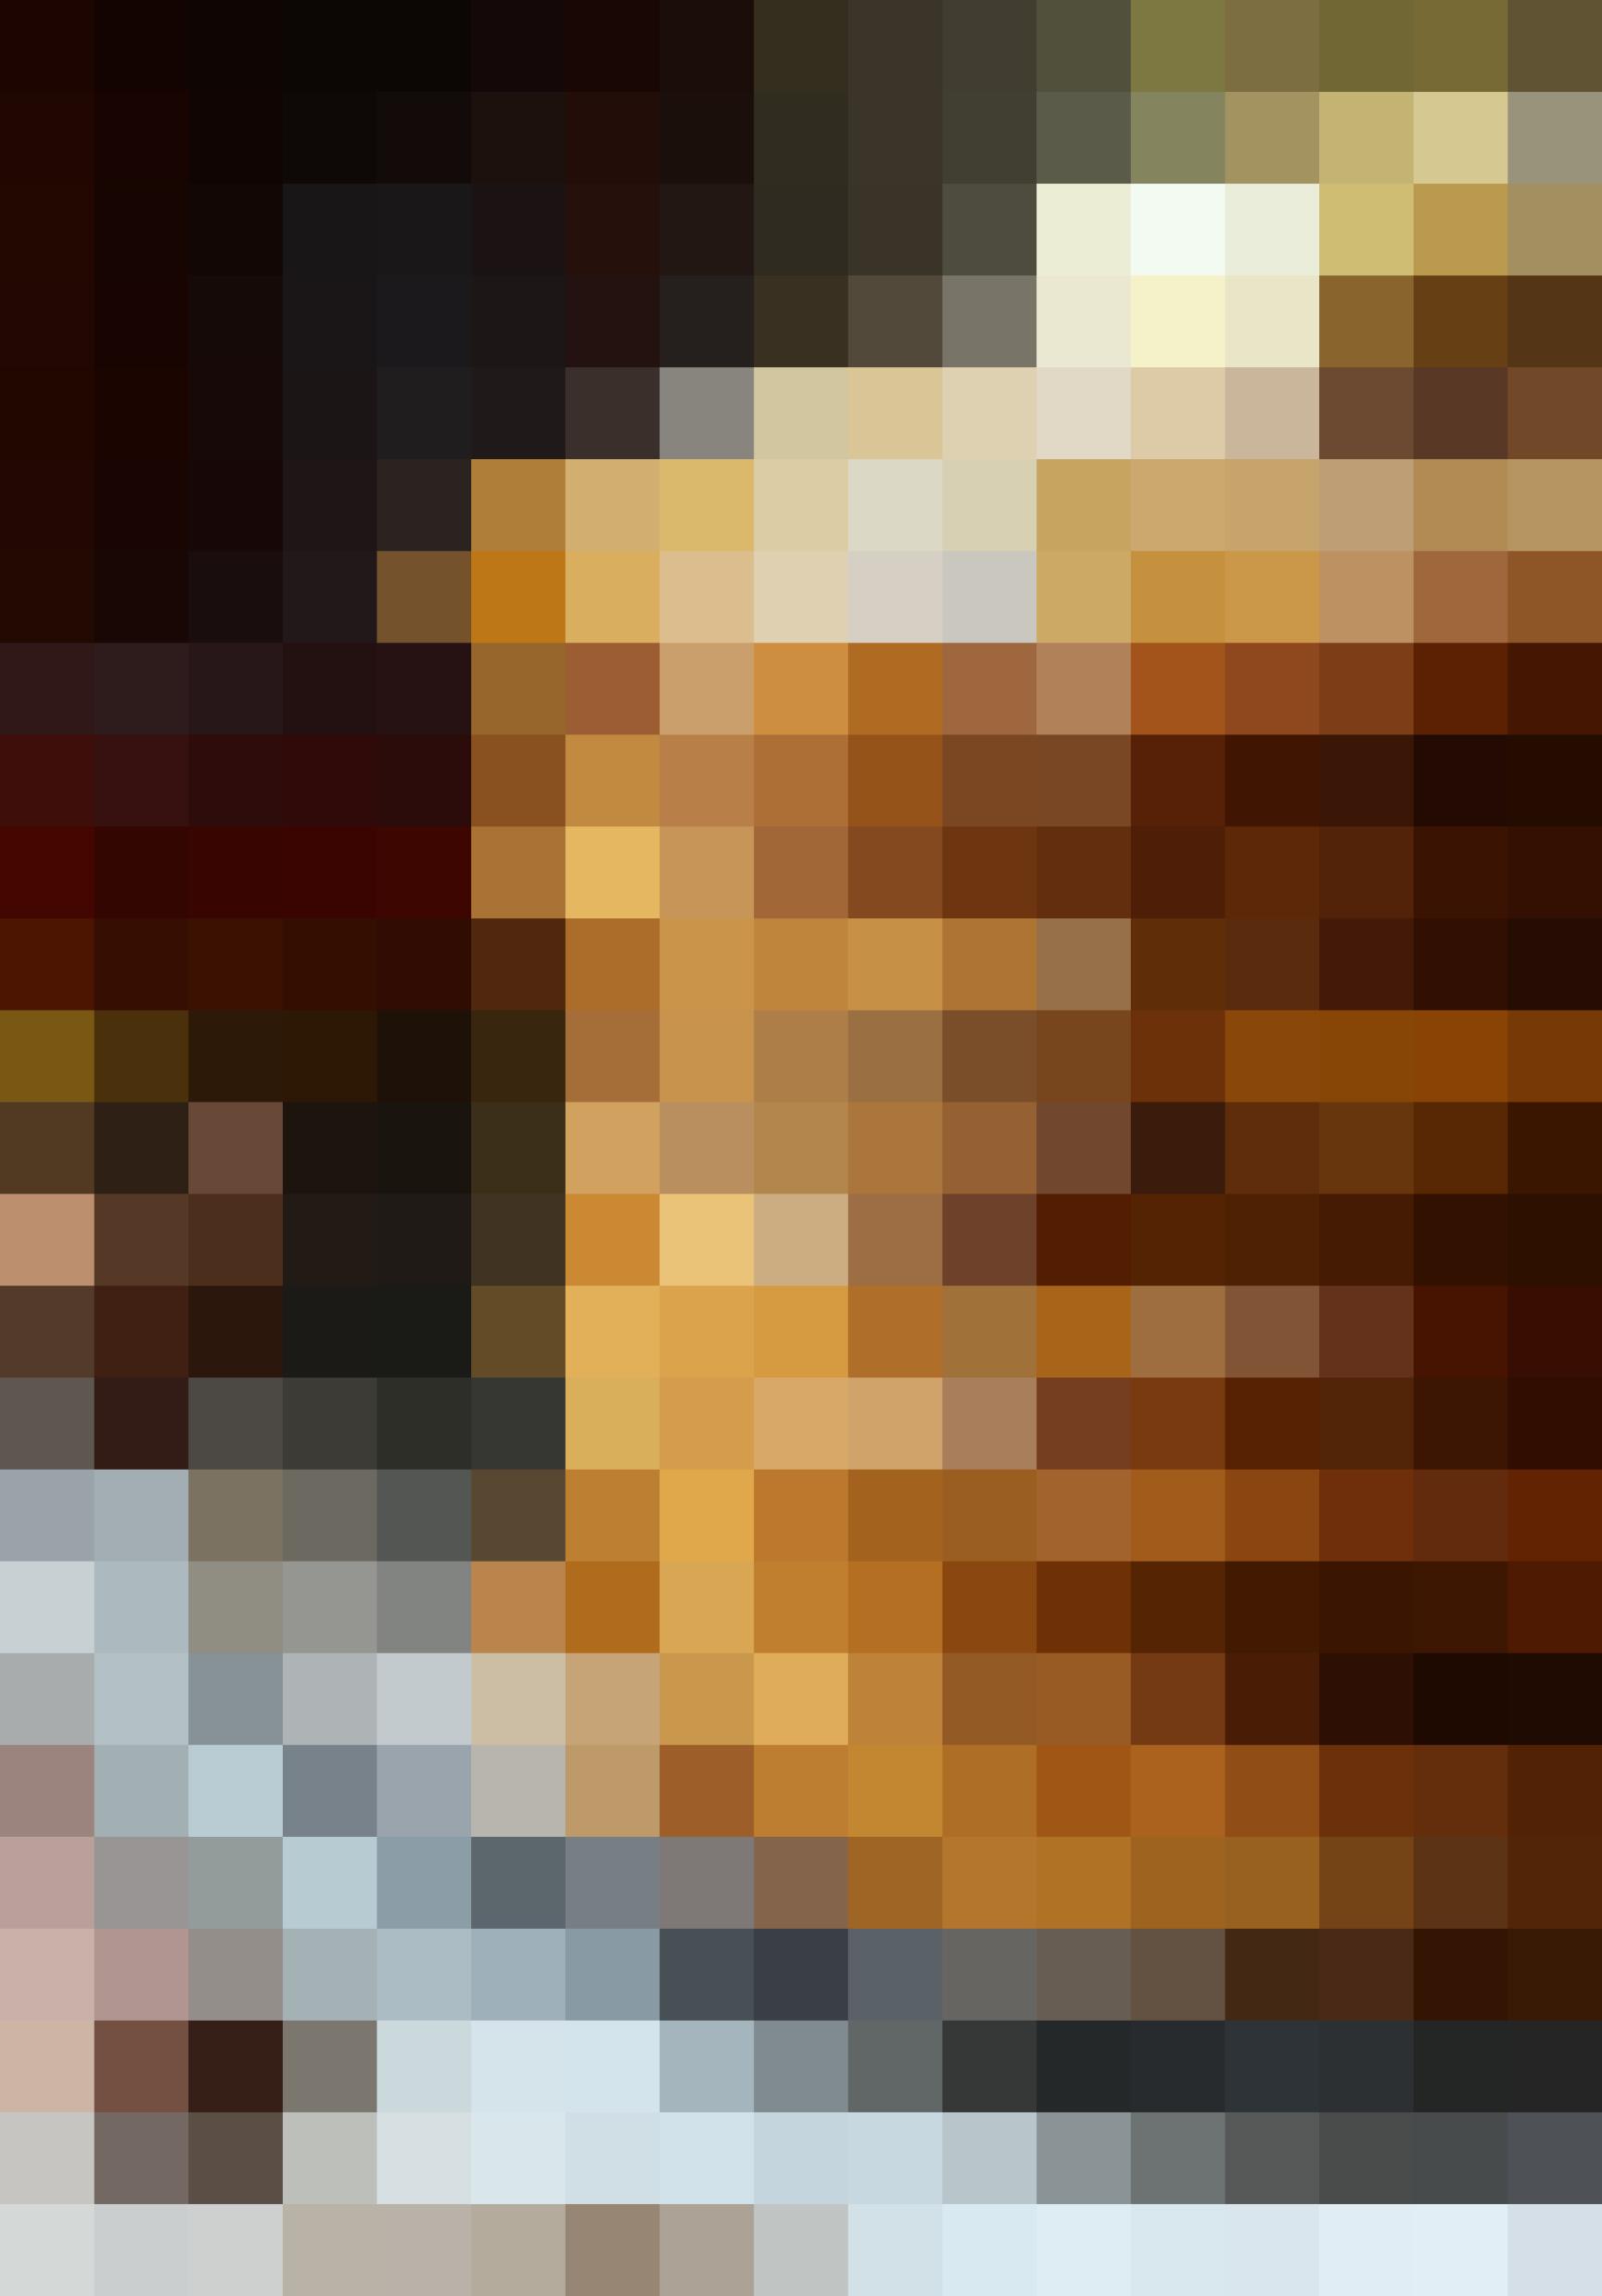 Pumpkin Pie in a Mug, Pull-Apart Cheese Bread, Red Lentil Soup, Lamb Rogan Josh & Pretzel Cinnamon Rolls: gallery image 10